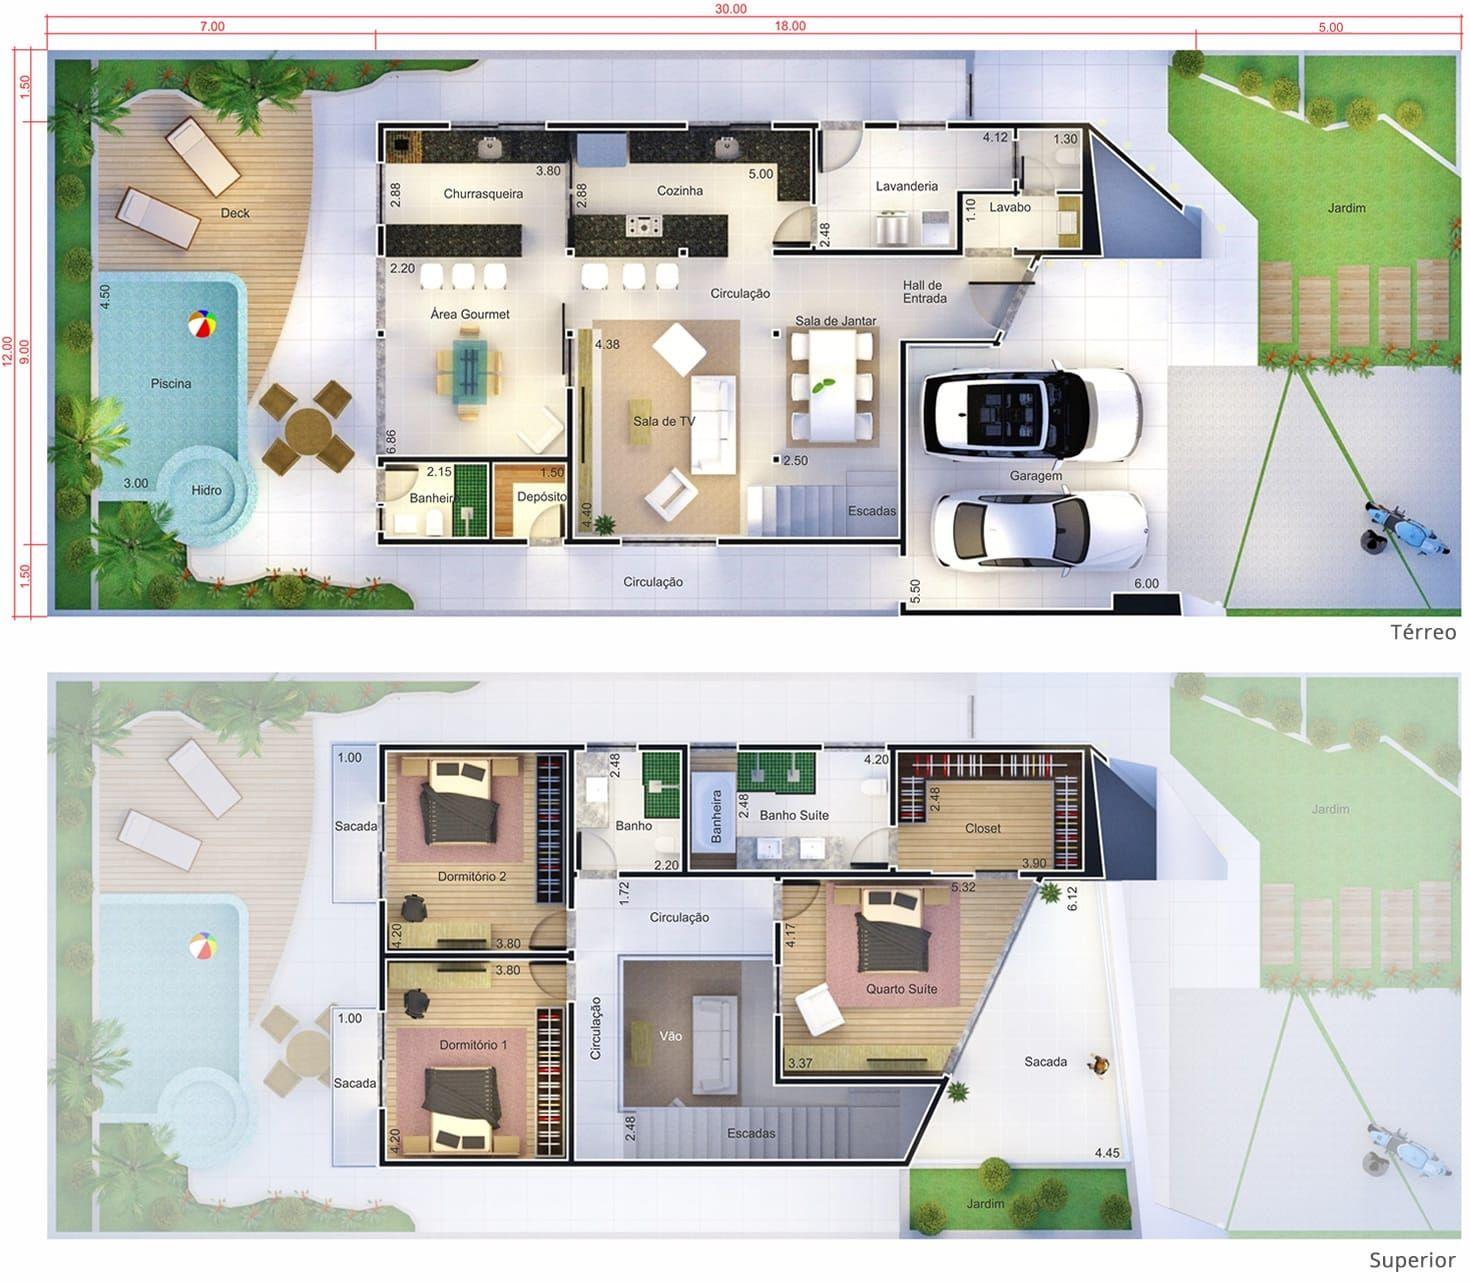 Plano de casa con un dise o innovador plano para terreno - Planos y disenos de casas ...